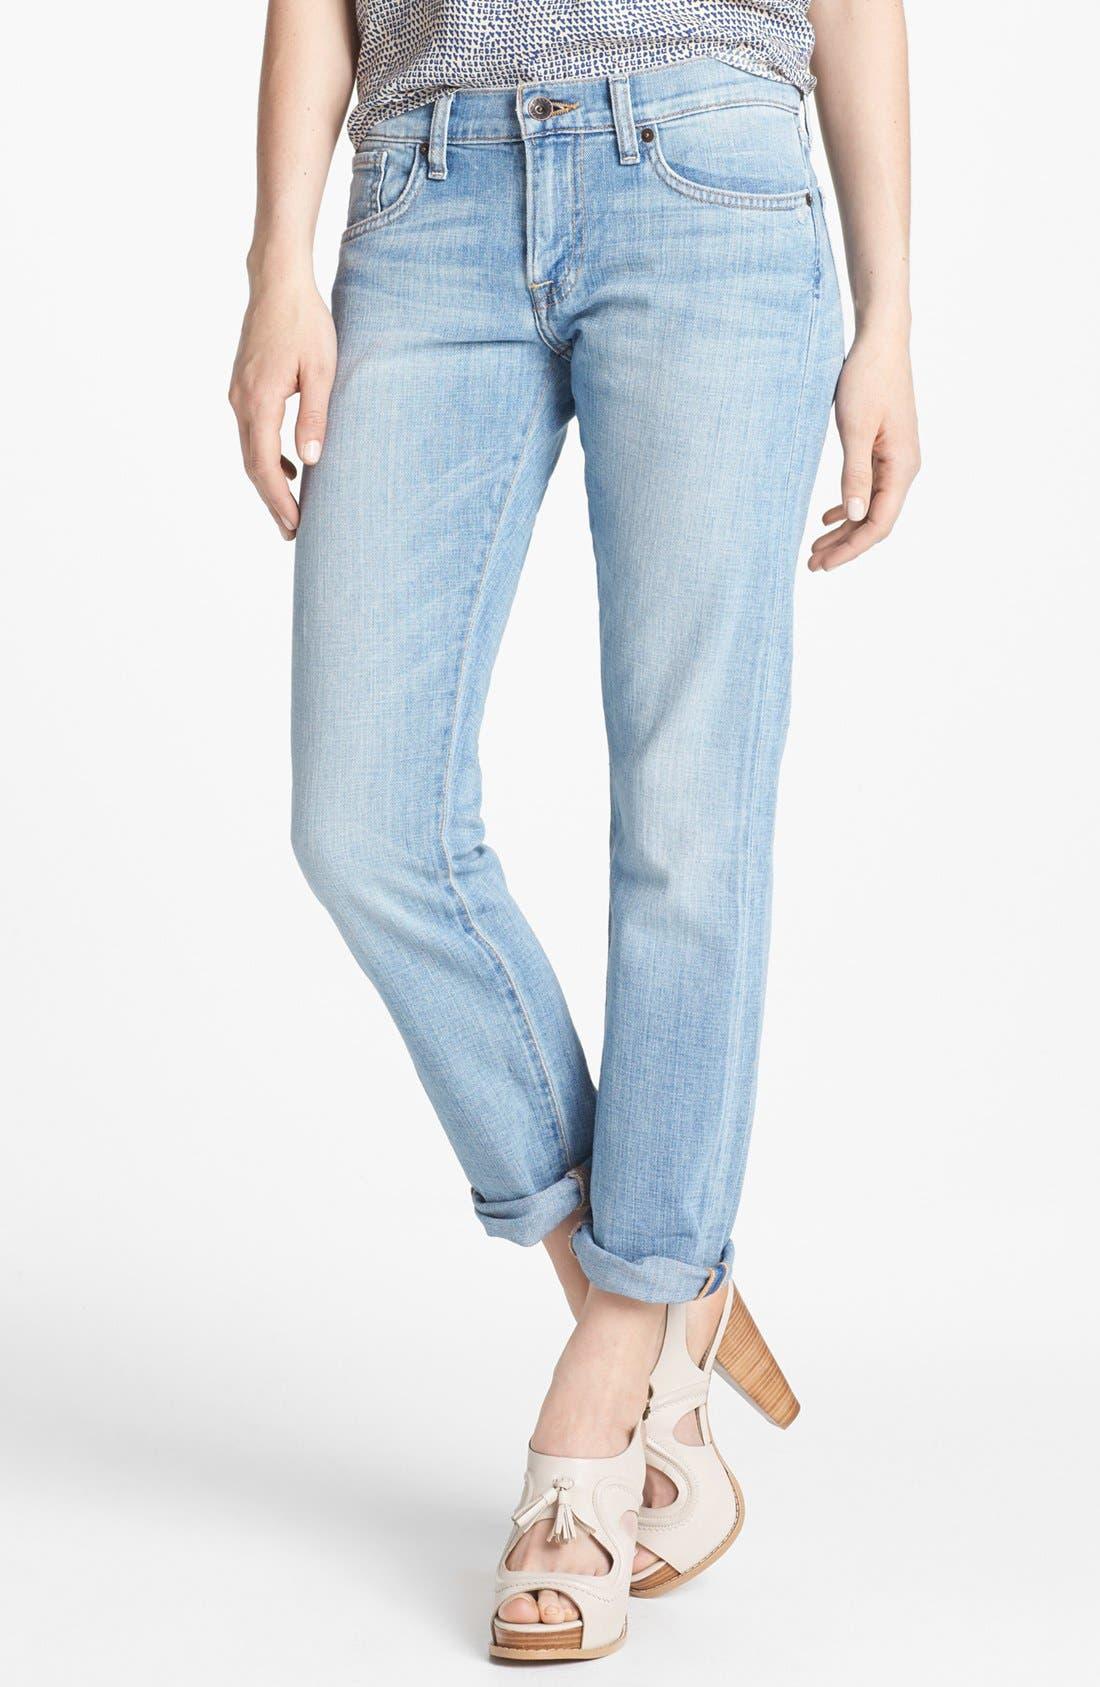 Alternate Image 1 Selected - Lucky Brand 'Sienna' Tomboy Crop Jeans (La Jolla)